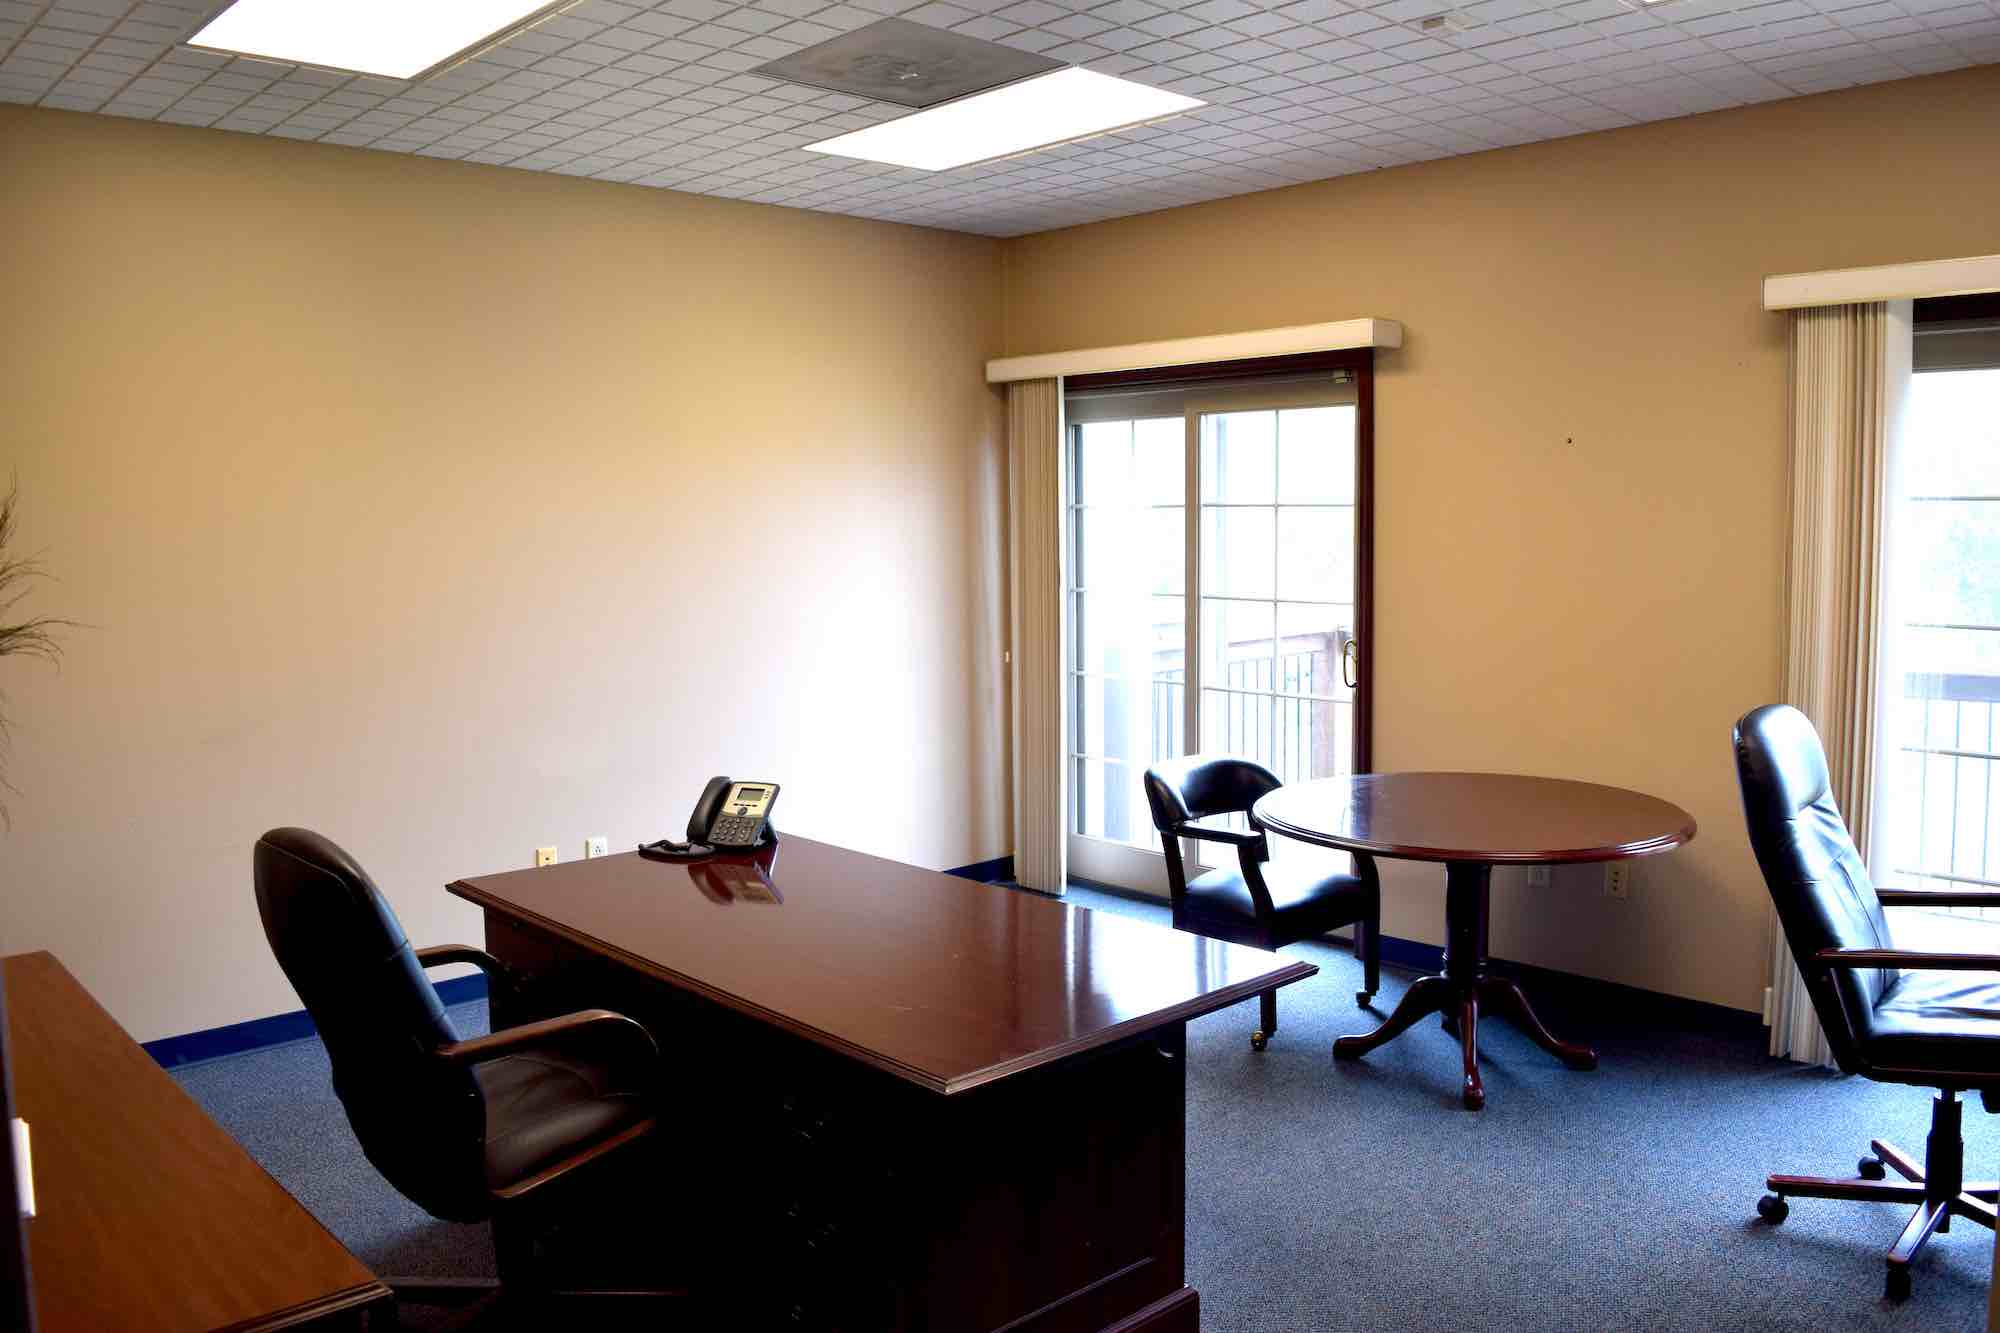 212 Office